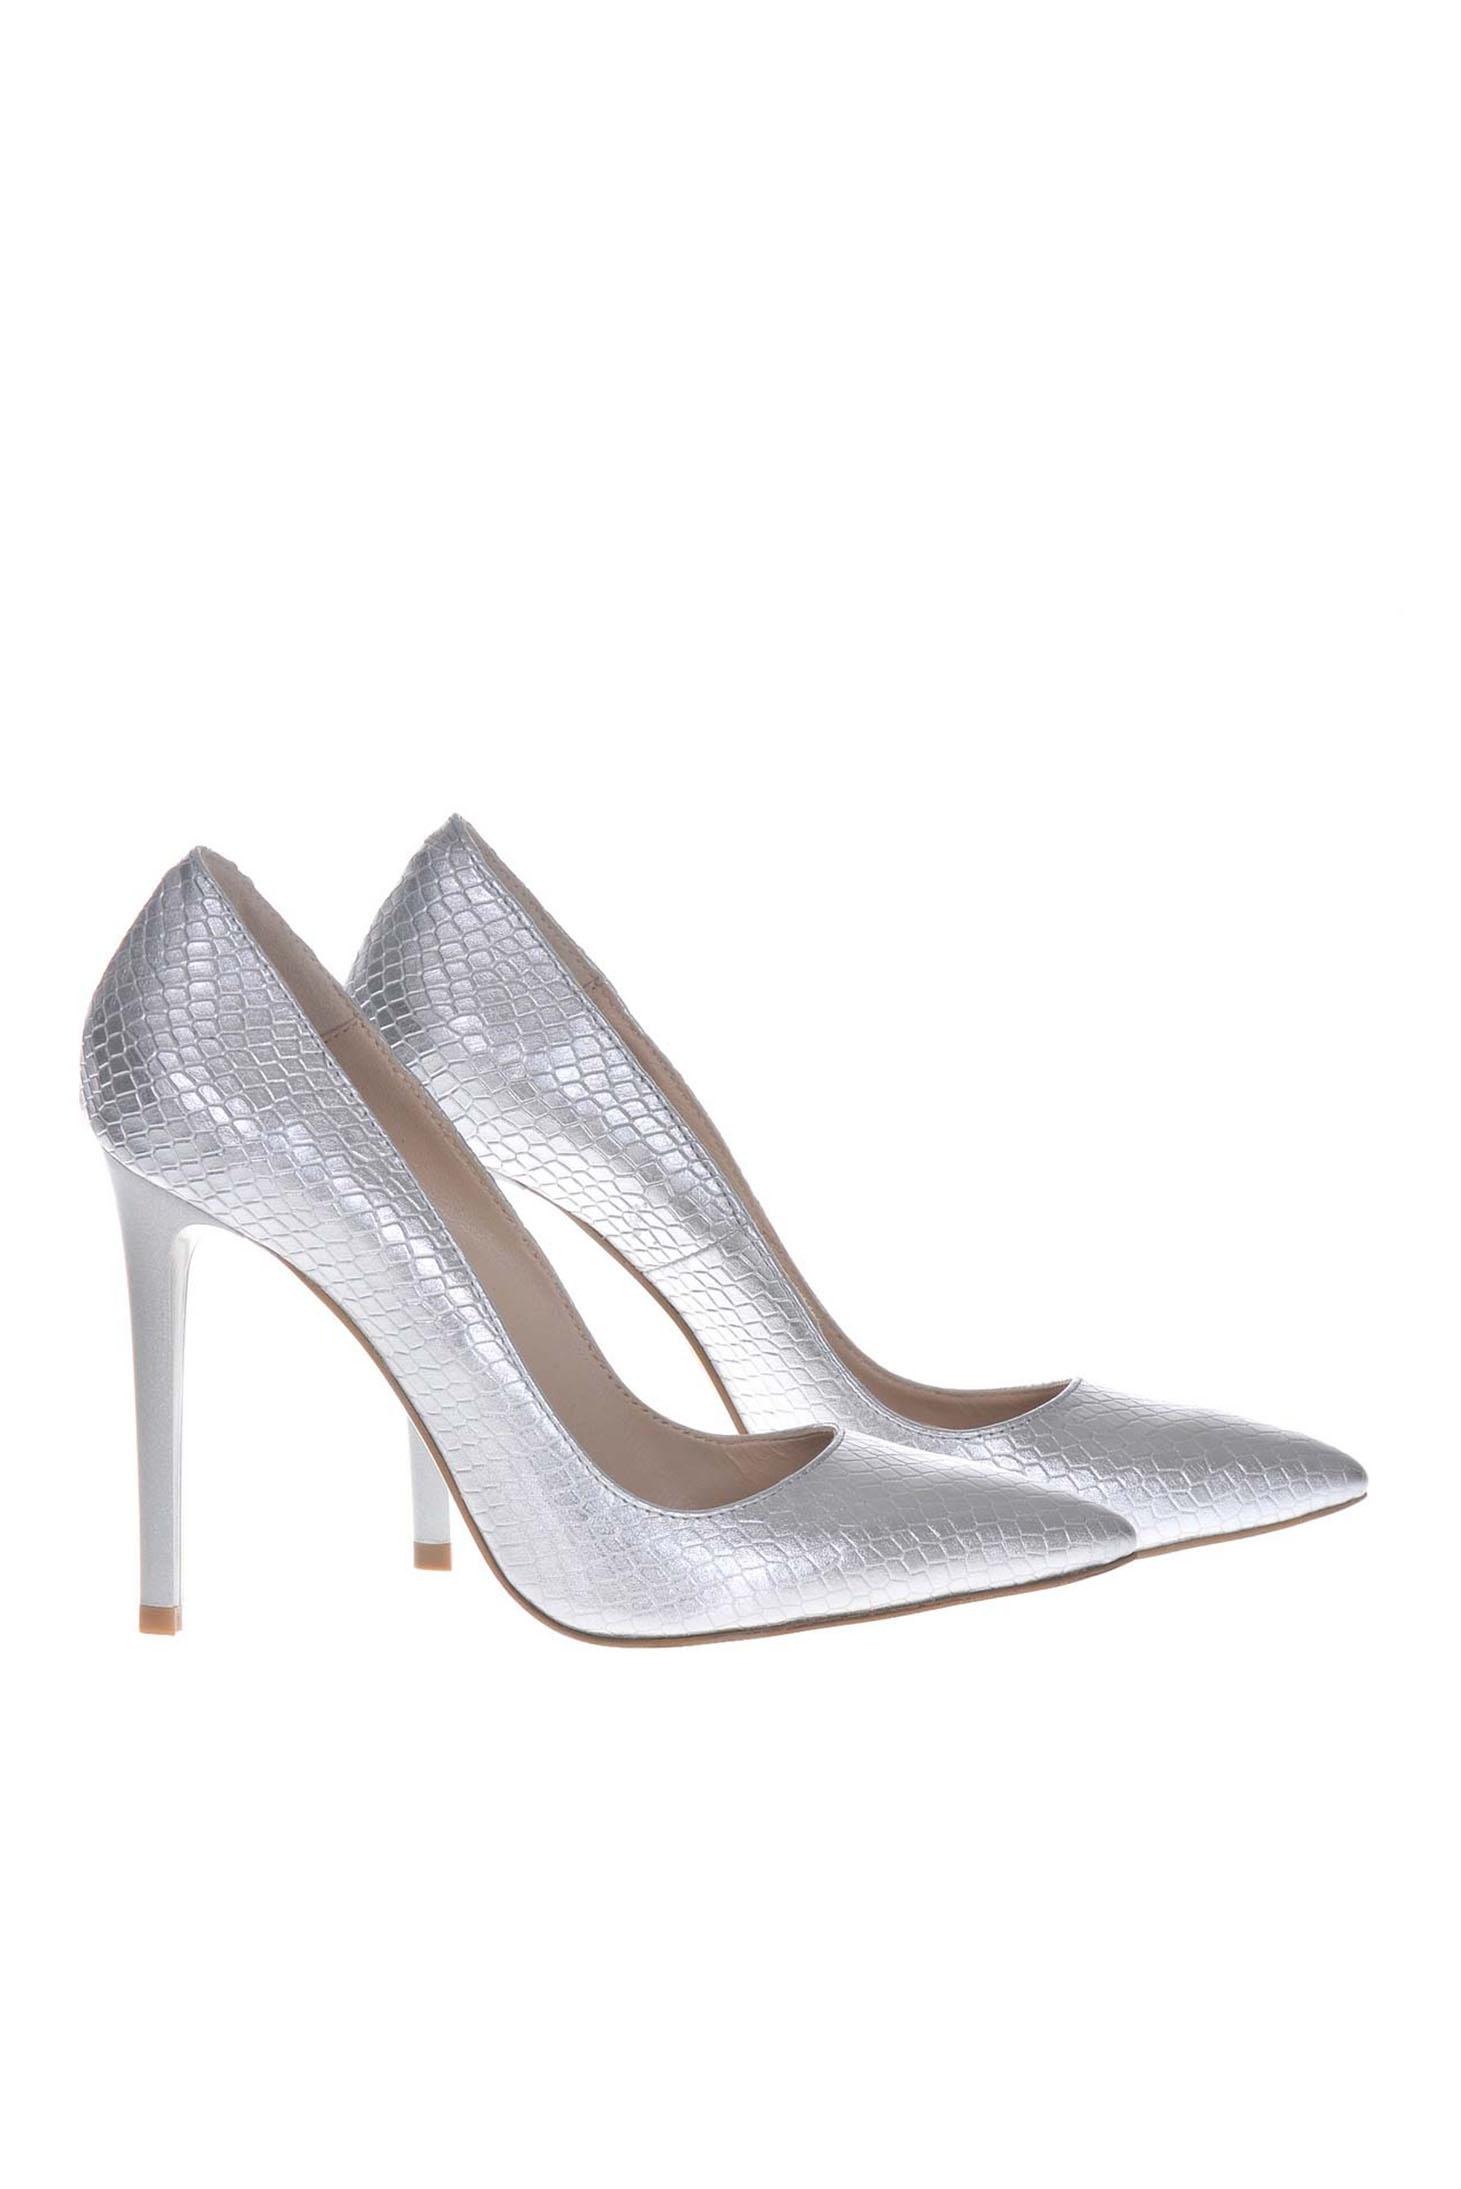 Ezüst stiletto elegáns magassarkú cipő 4b68f3a7c9